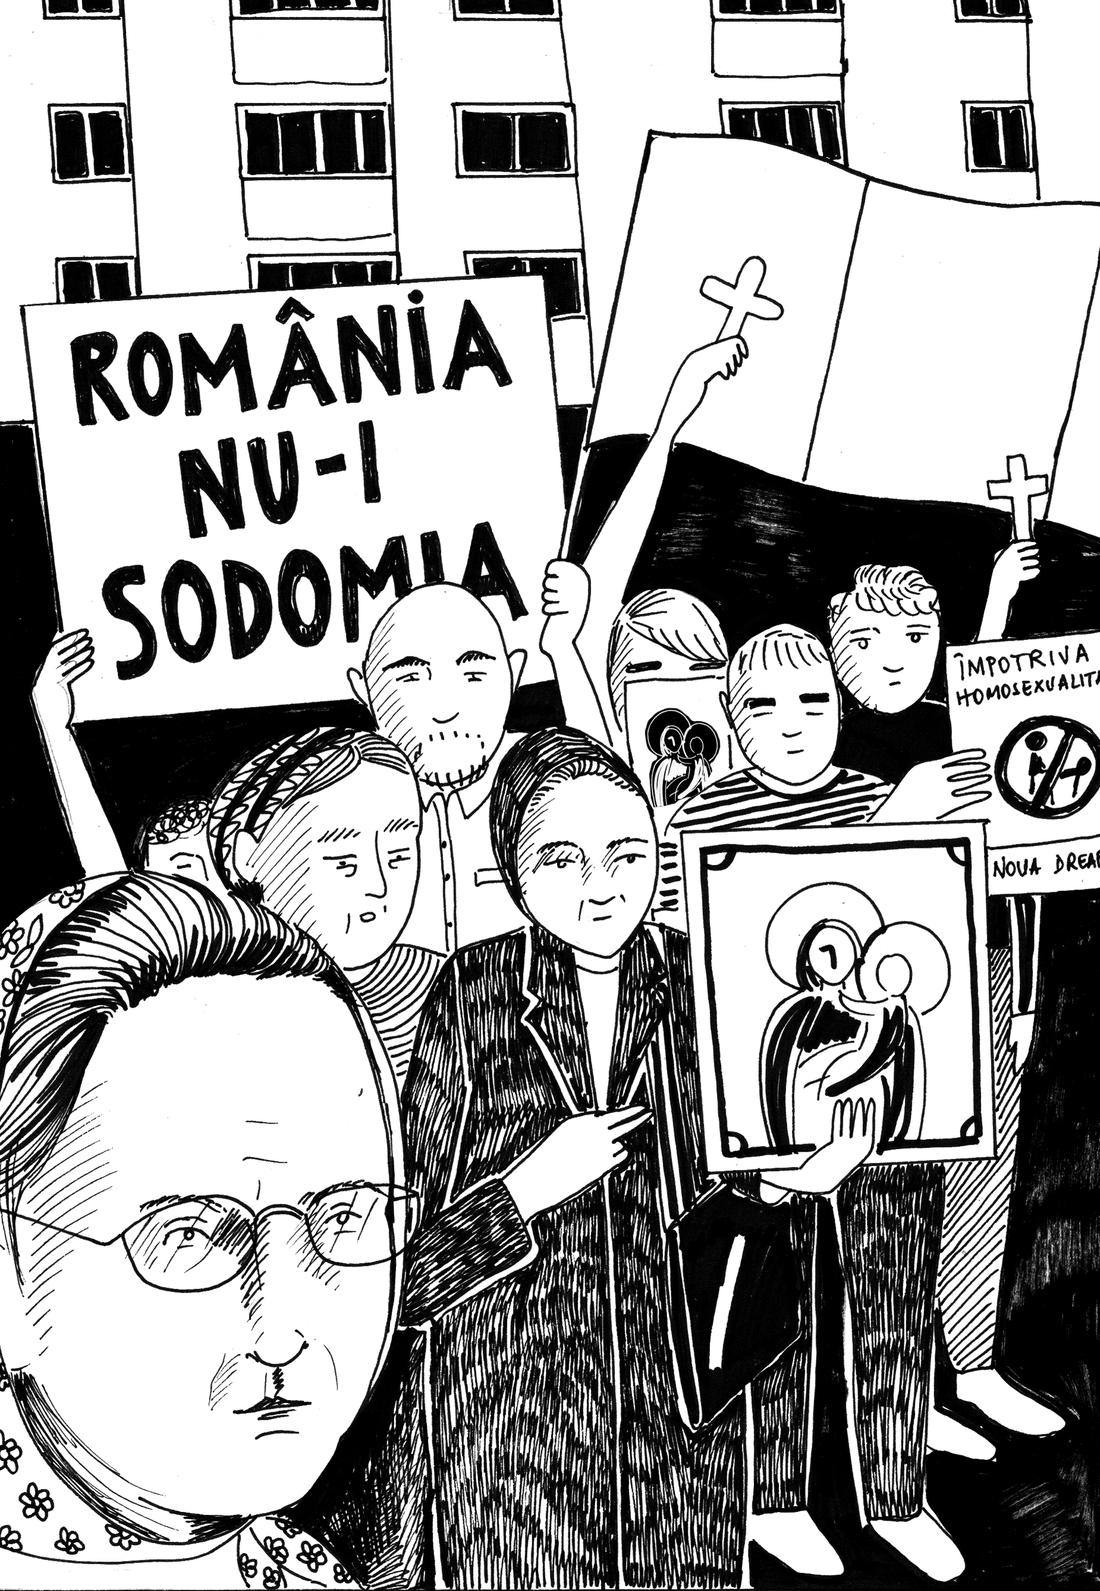 <em>Queer. Istorii ilustrate</em> – Eugen Rădescu & Andreea Chirică